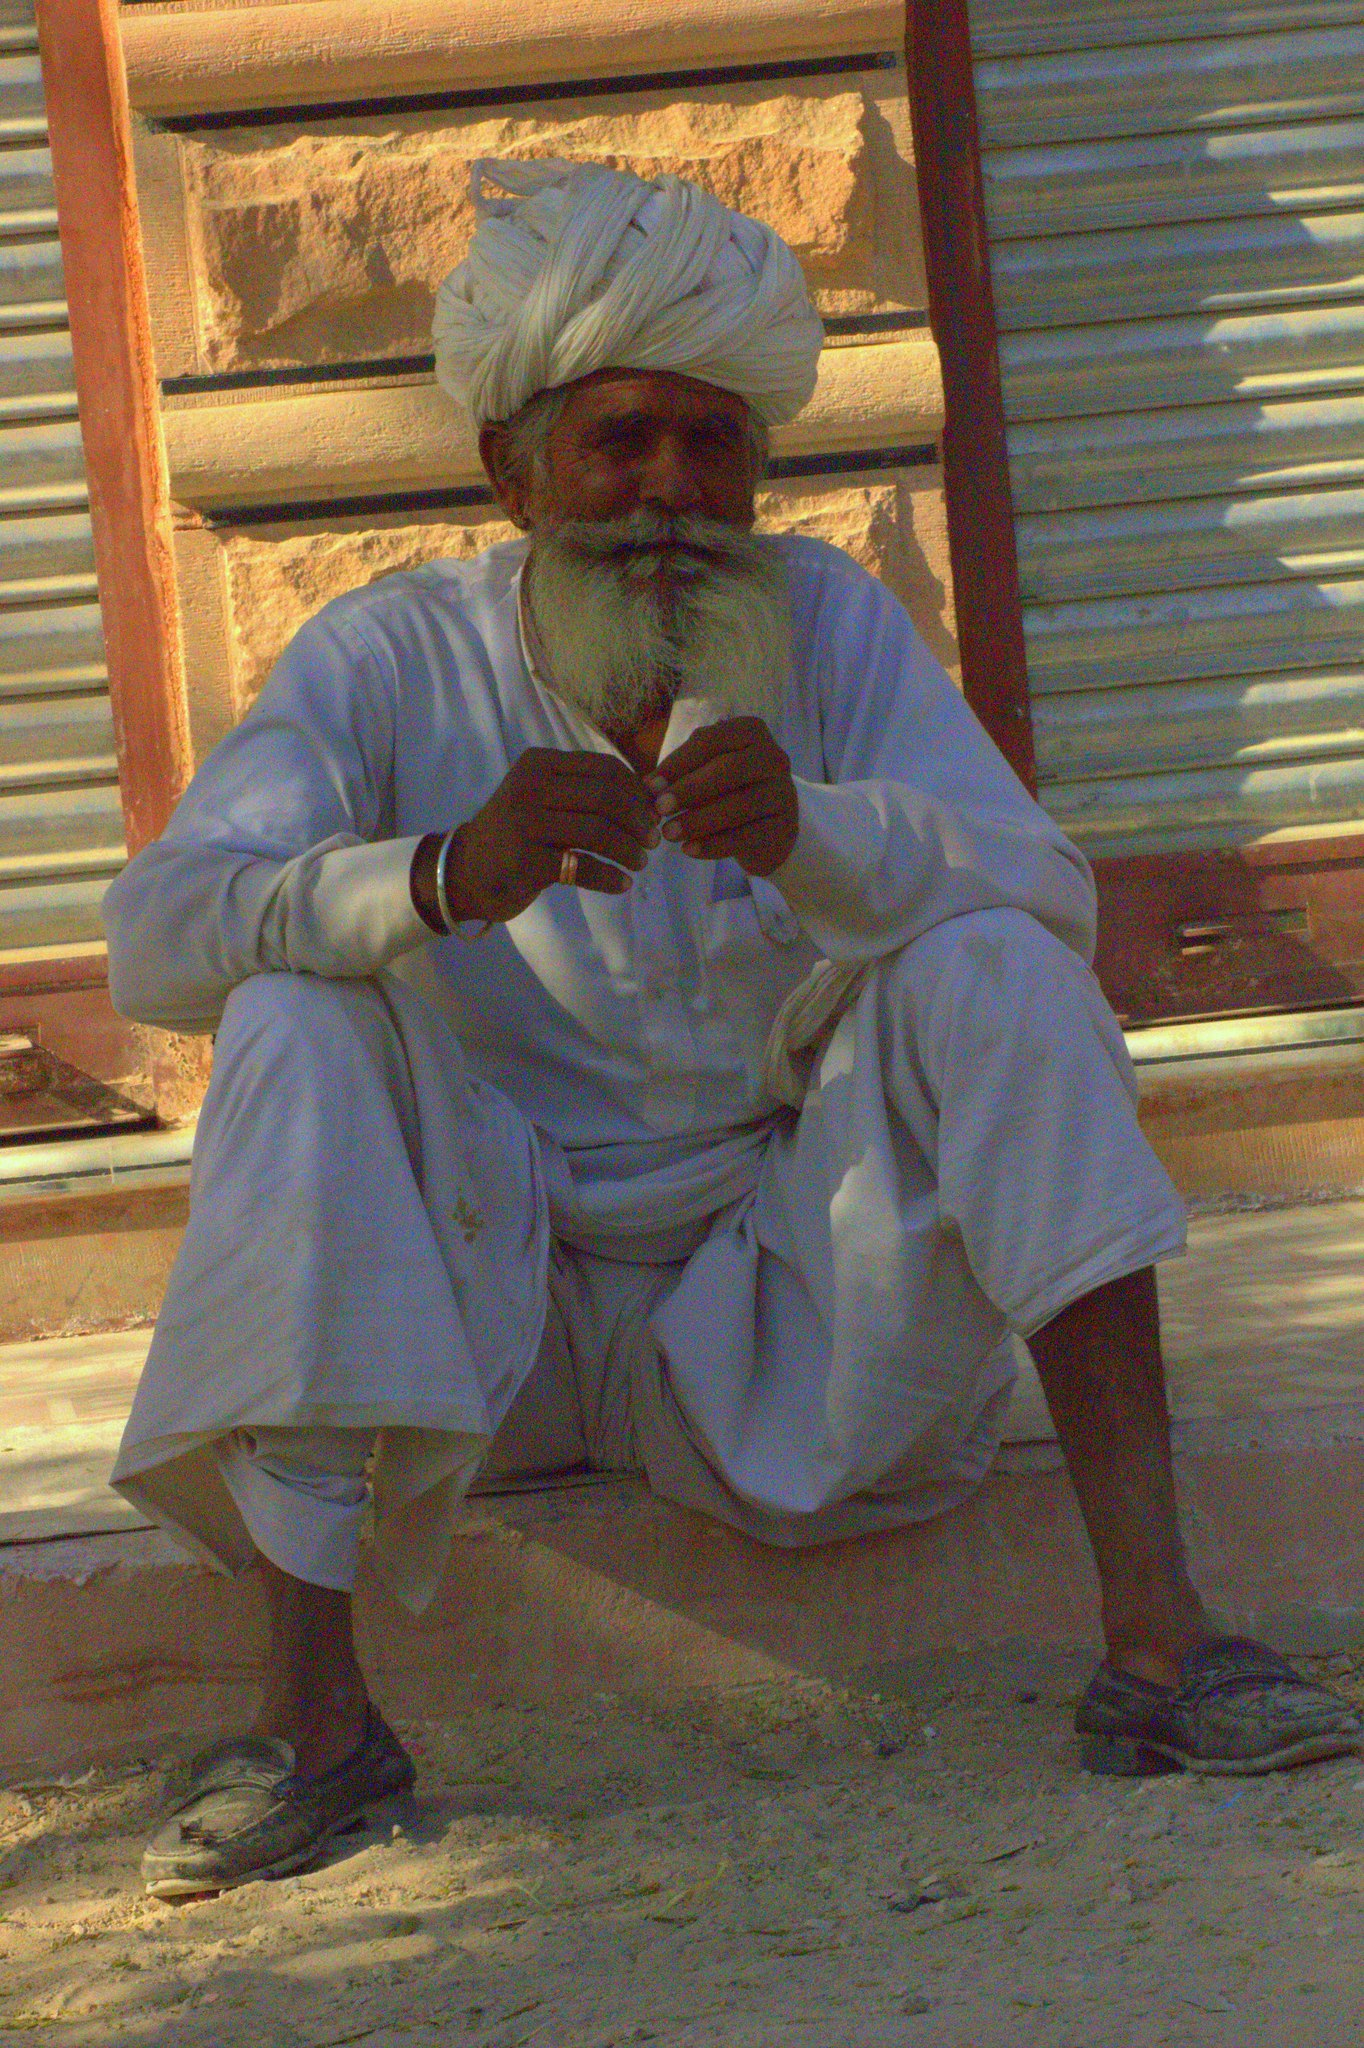 Men in turban of Salawas